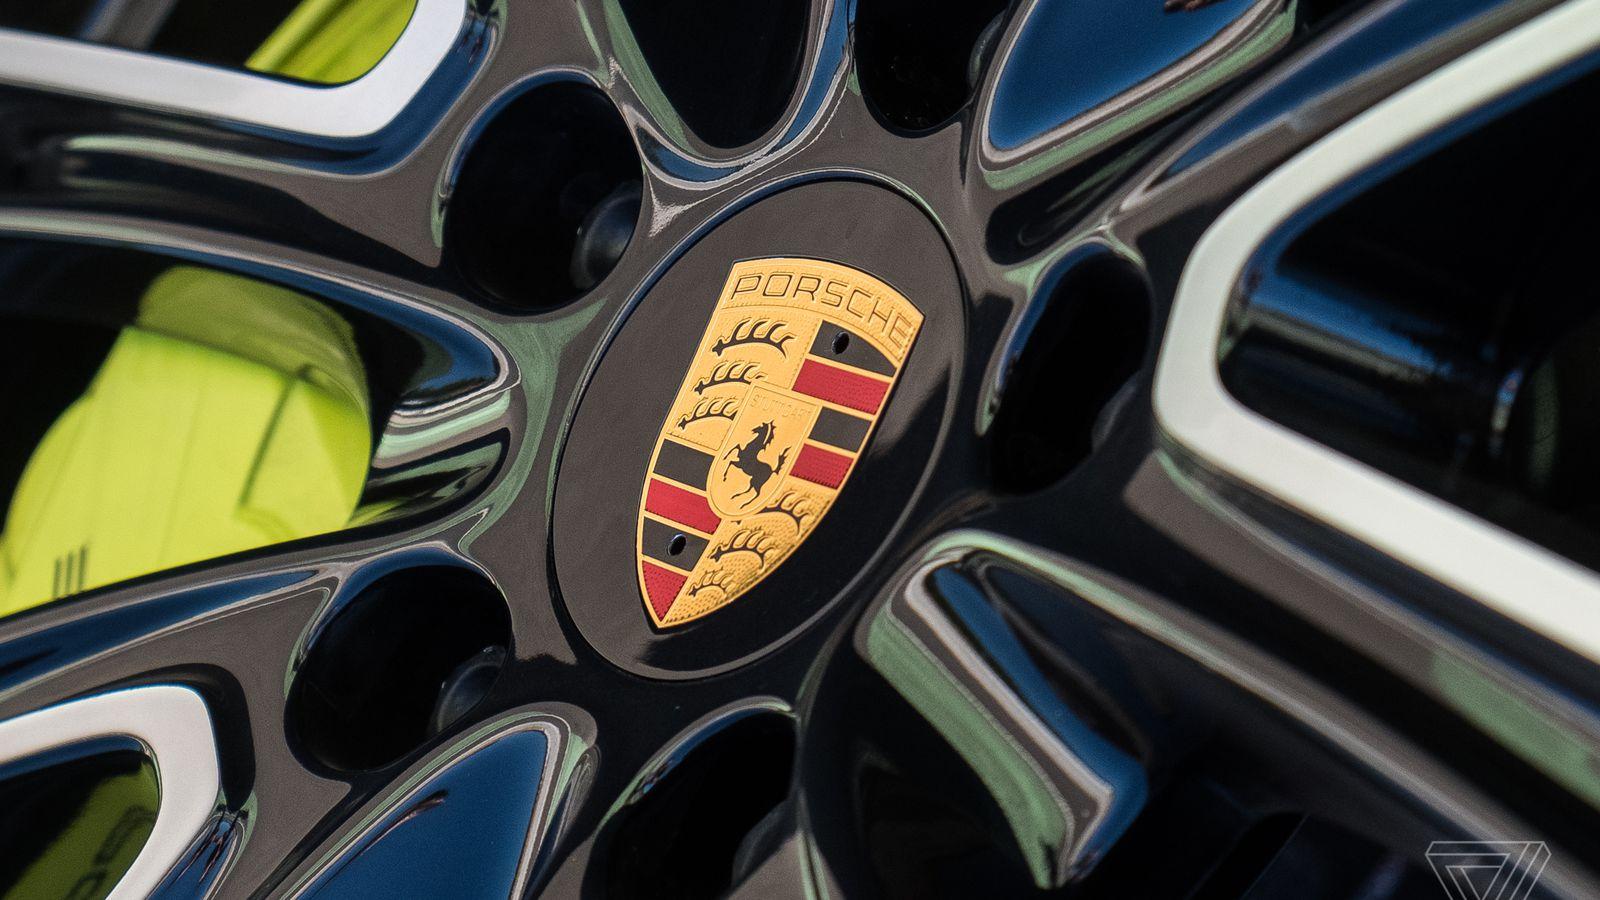 Porsche quits Le Mans to join electric racing series Formula E